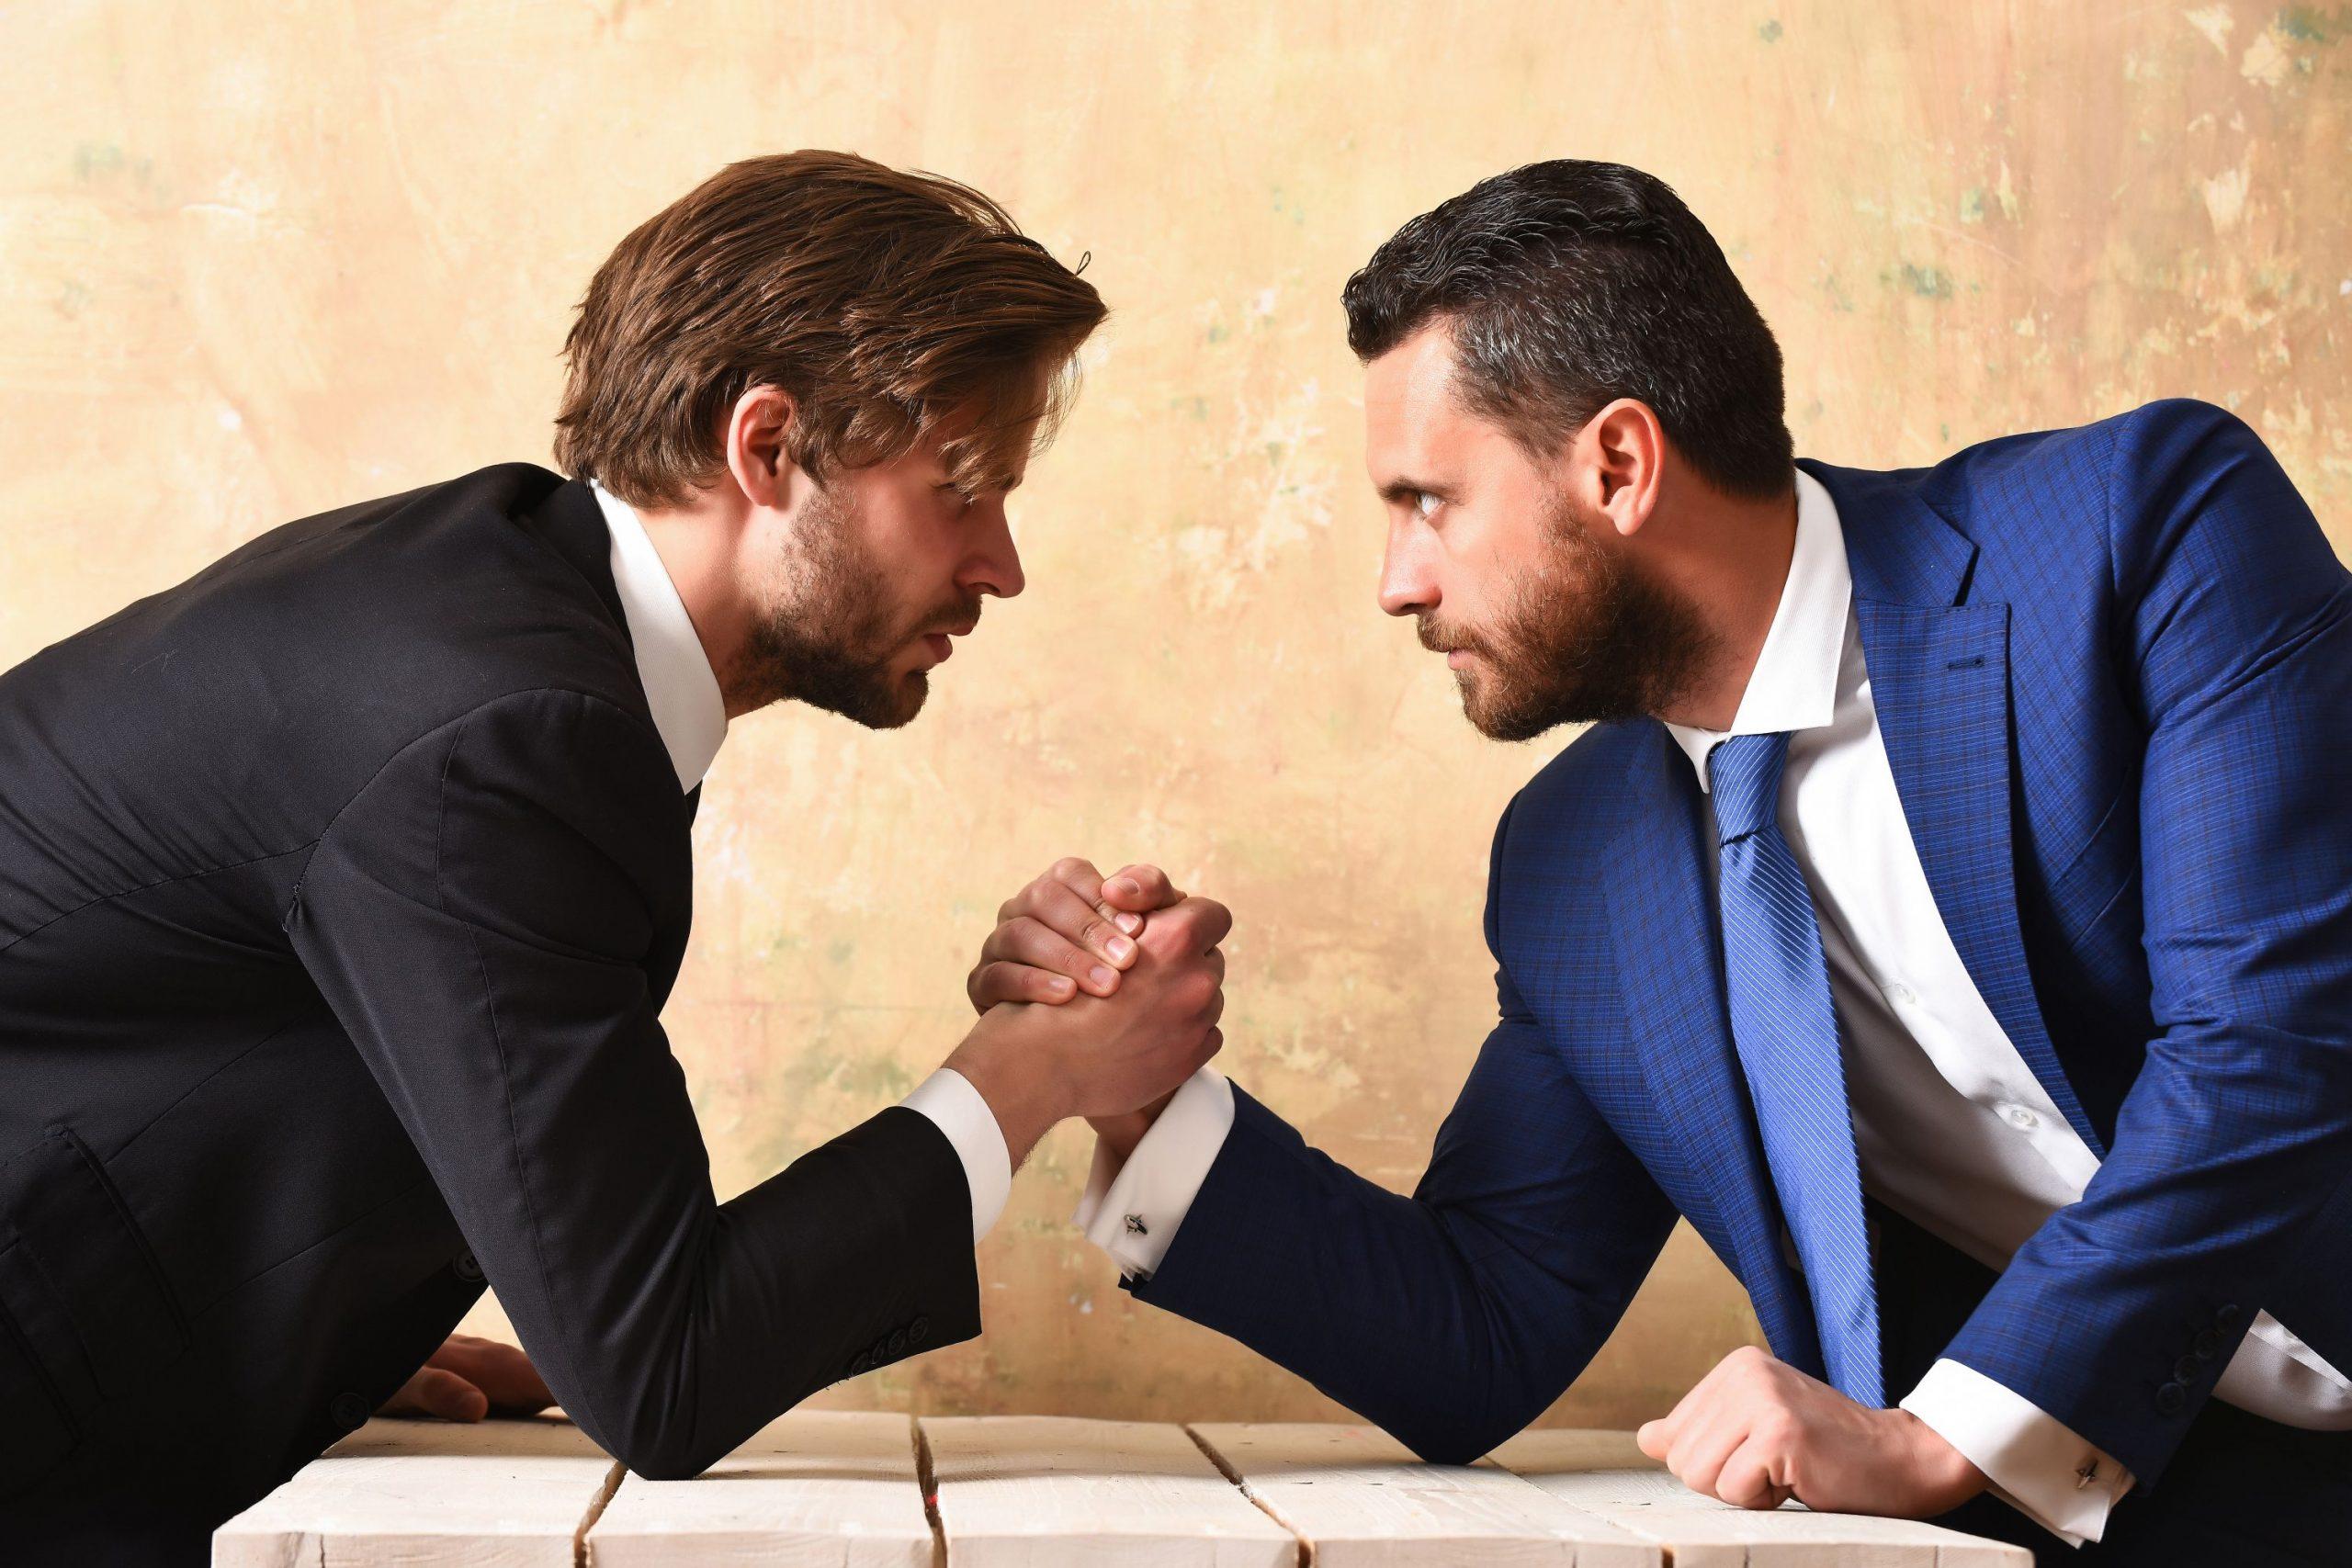 agent immobilier vs super agent immobilier